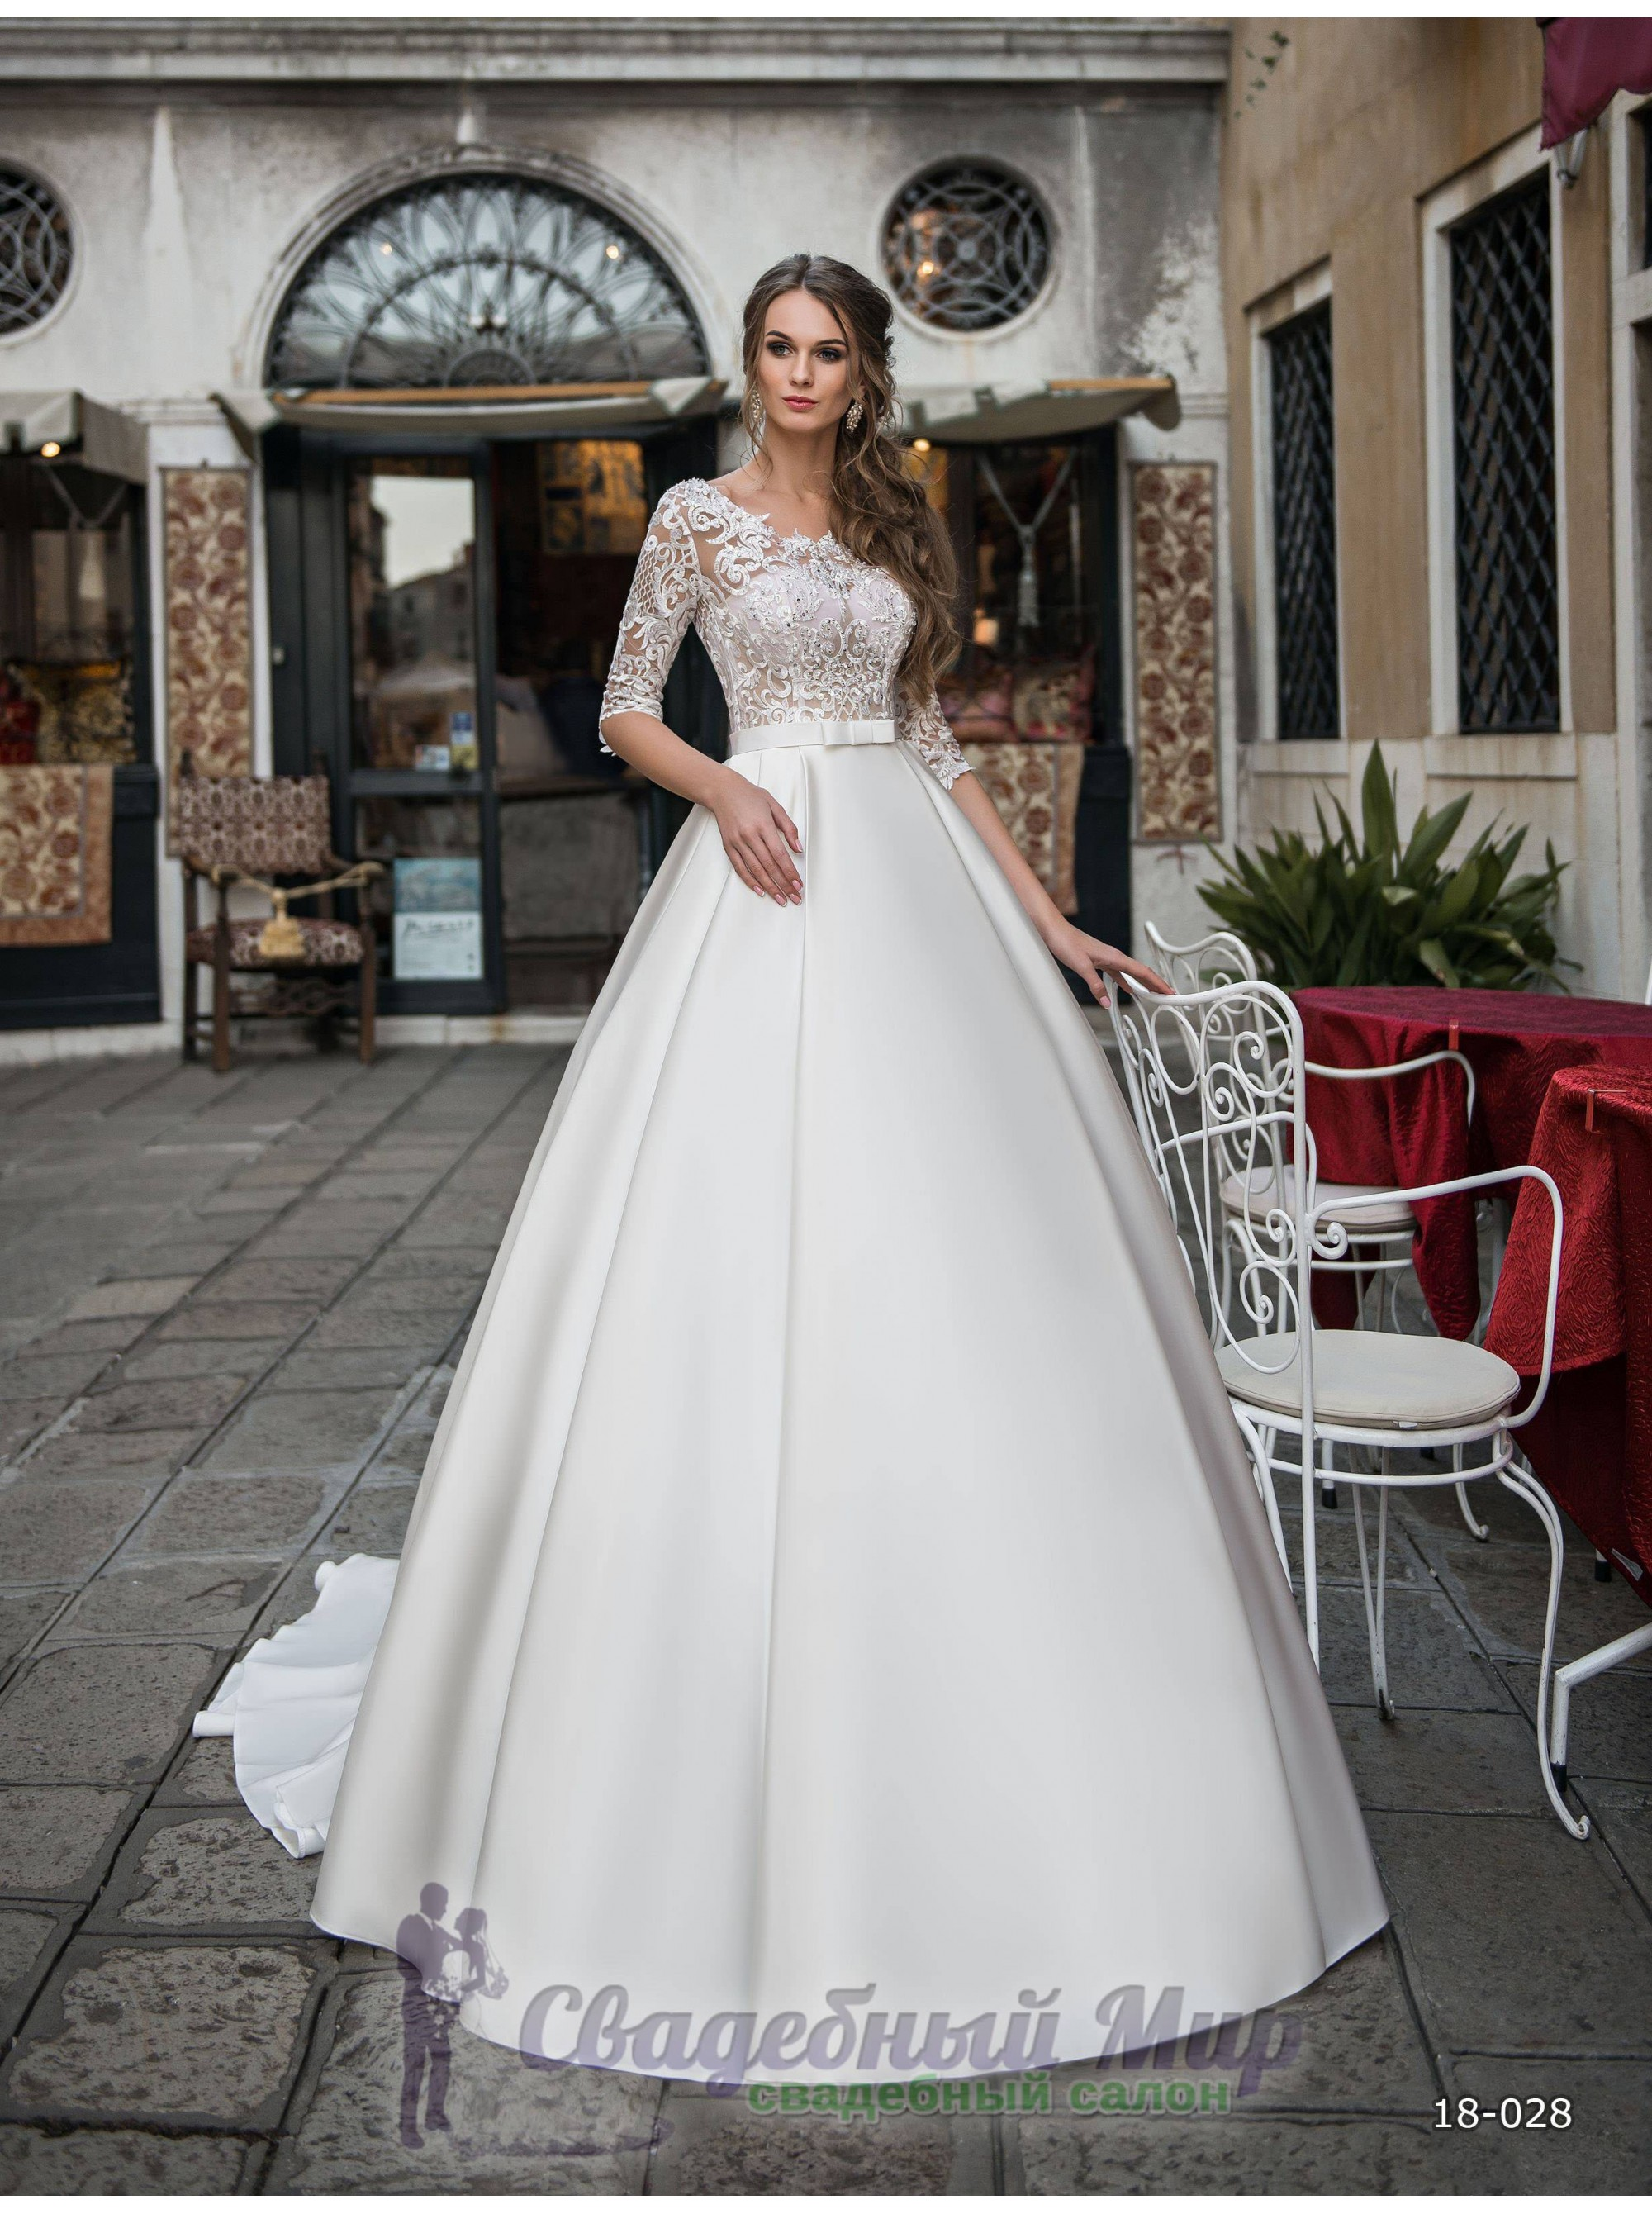 902636ae16a ... Свадебное платье 18-028